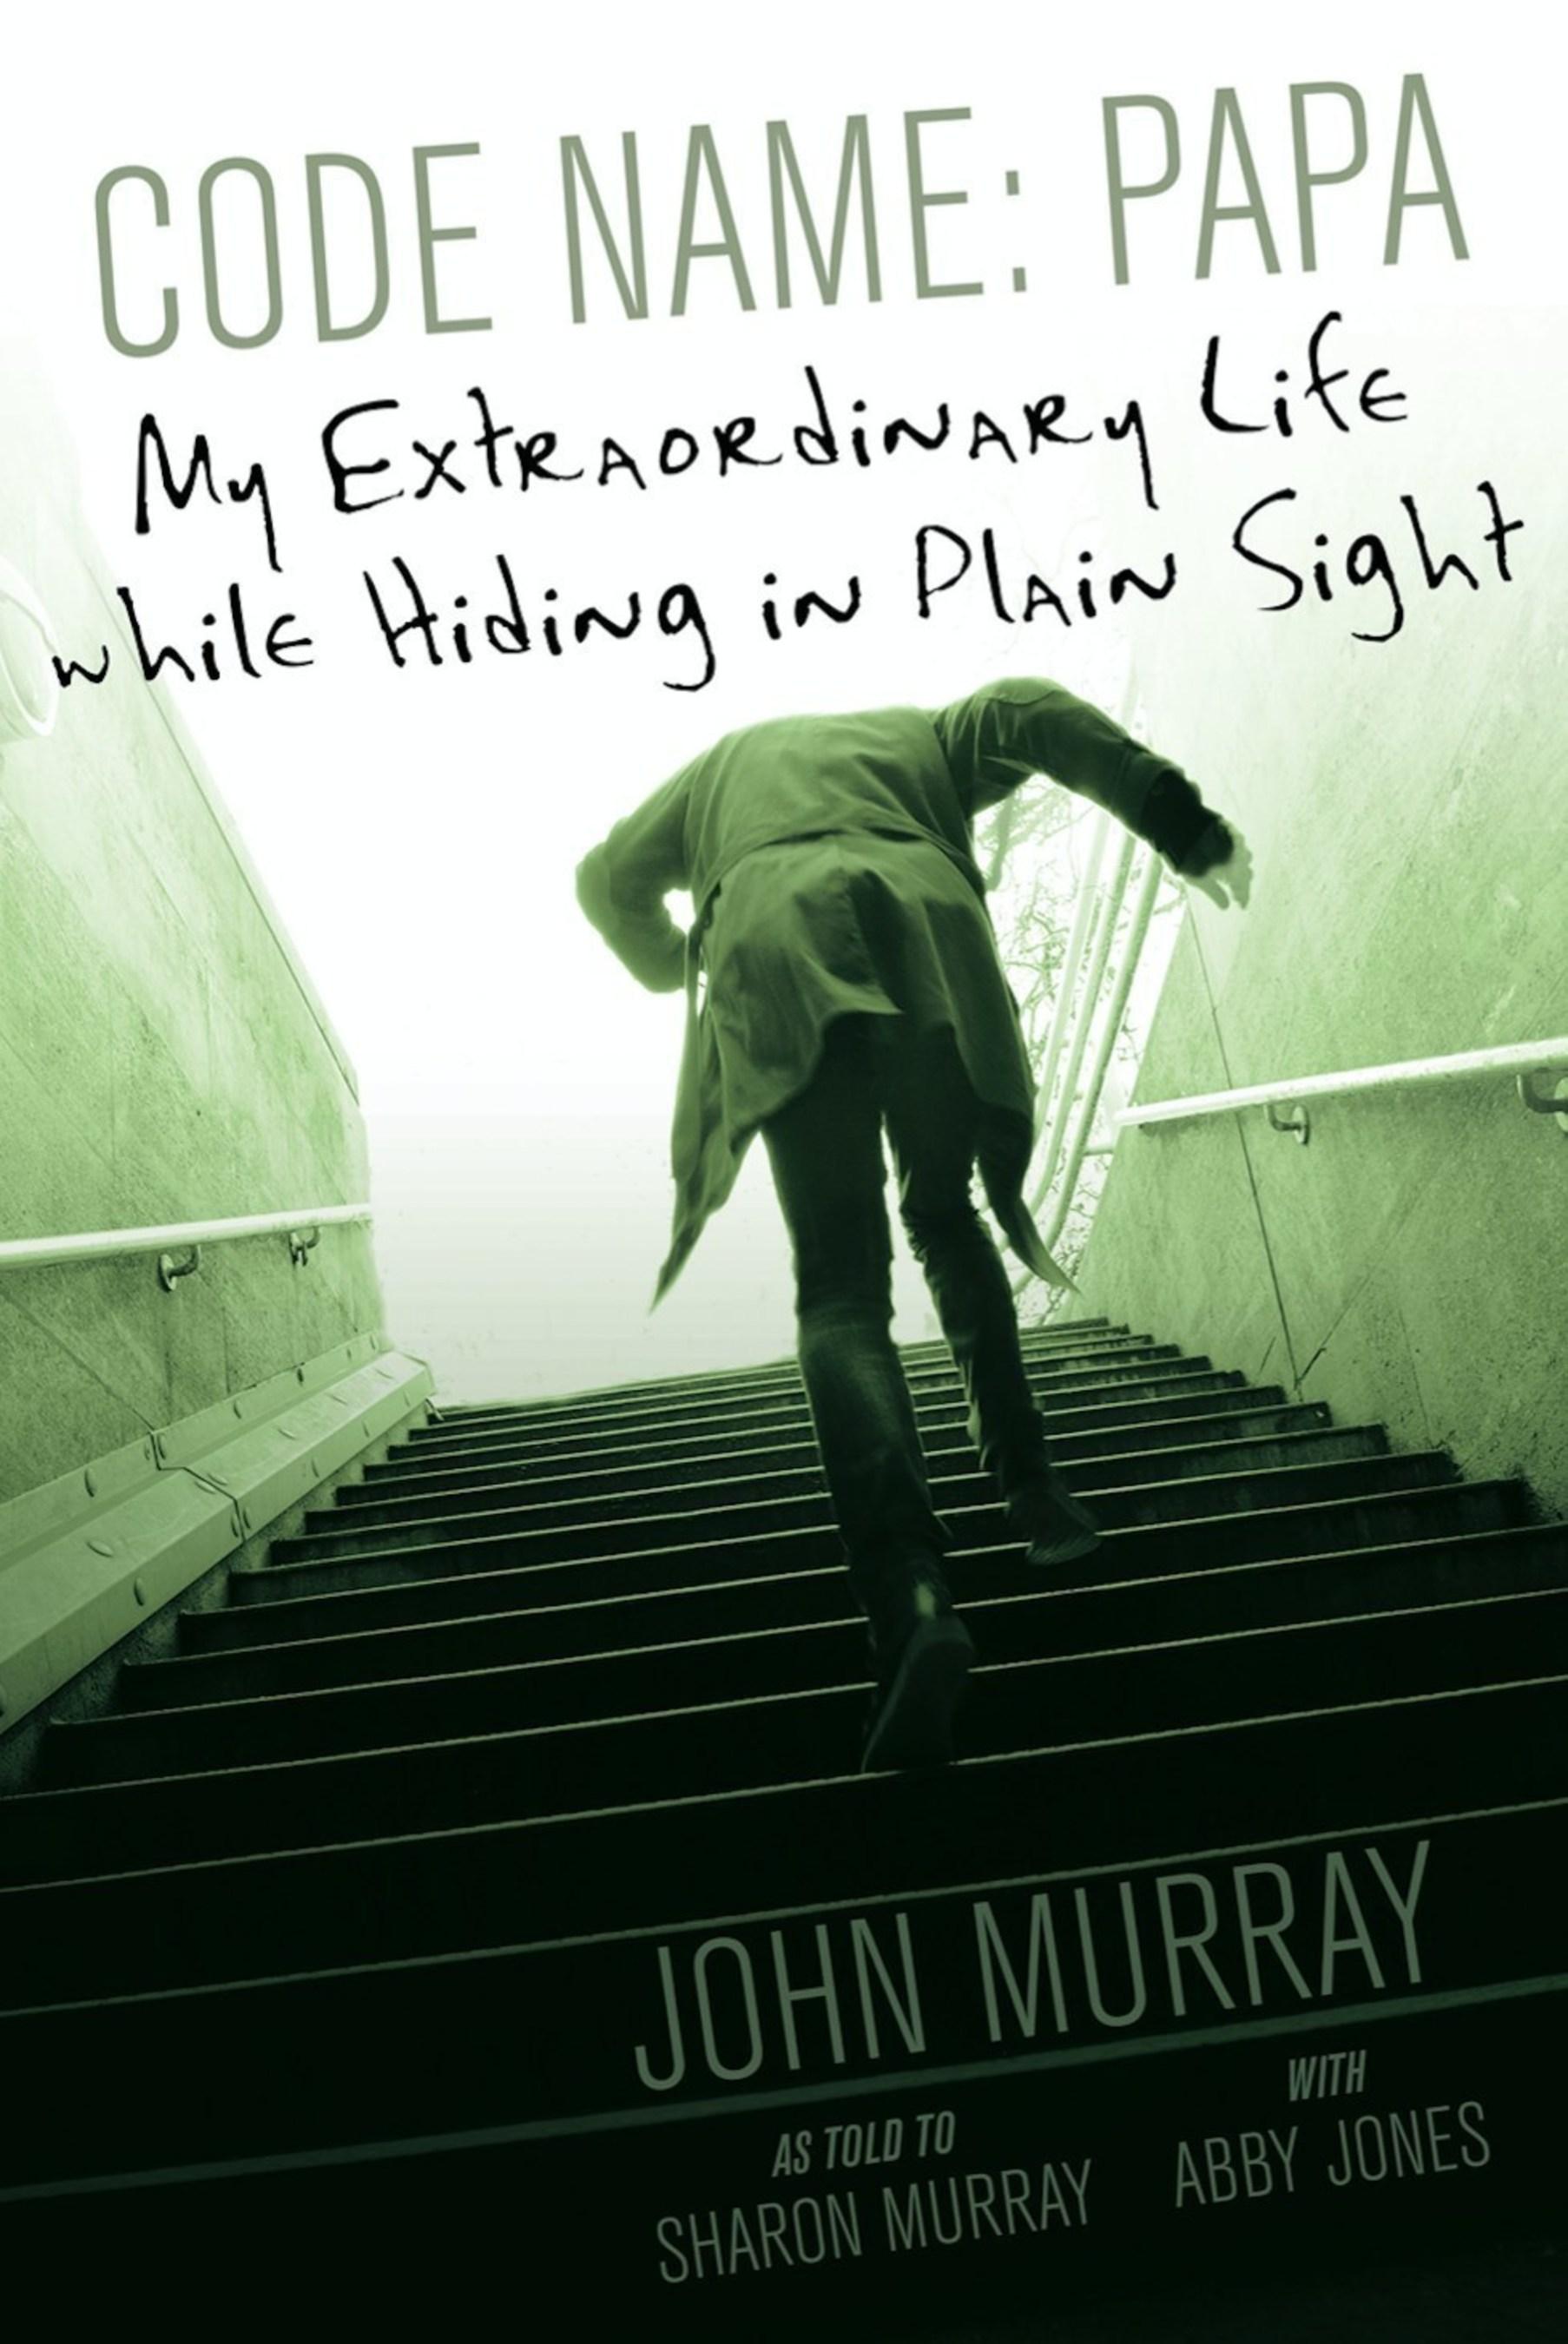 New Literary Memoir Documents Dedication of One Man's Life to American Espionage